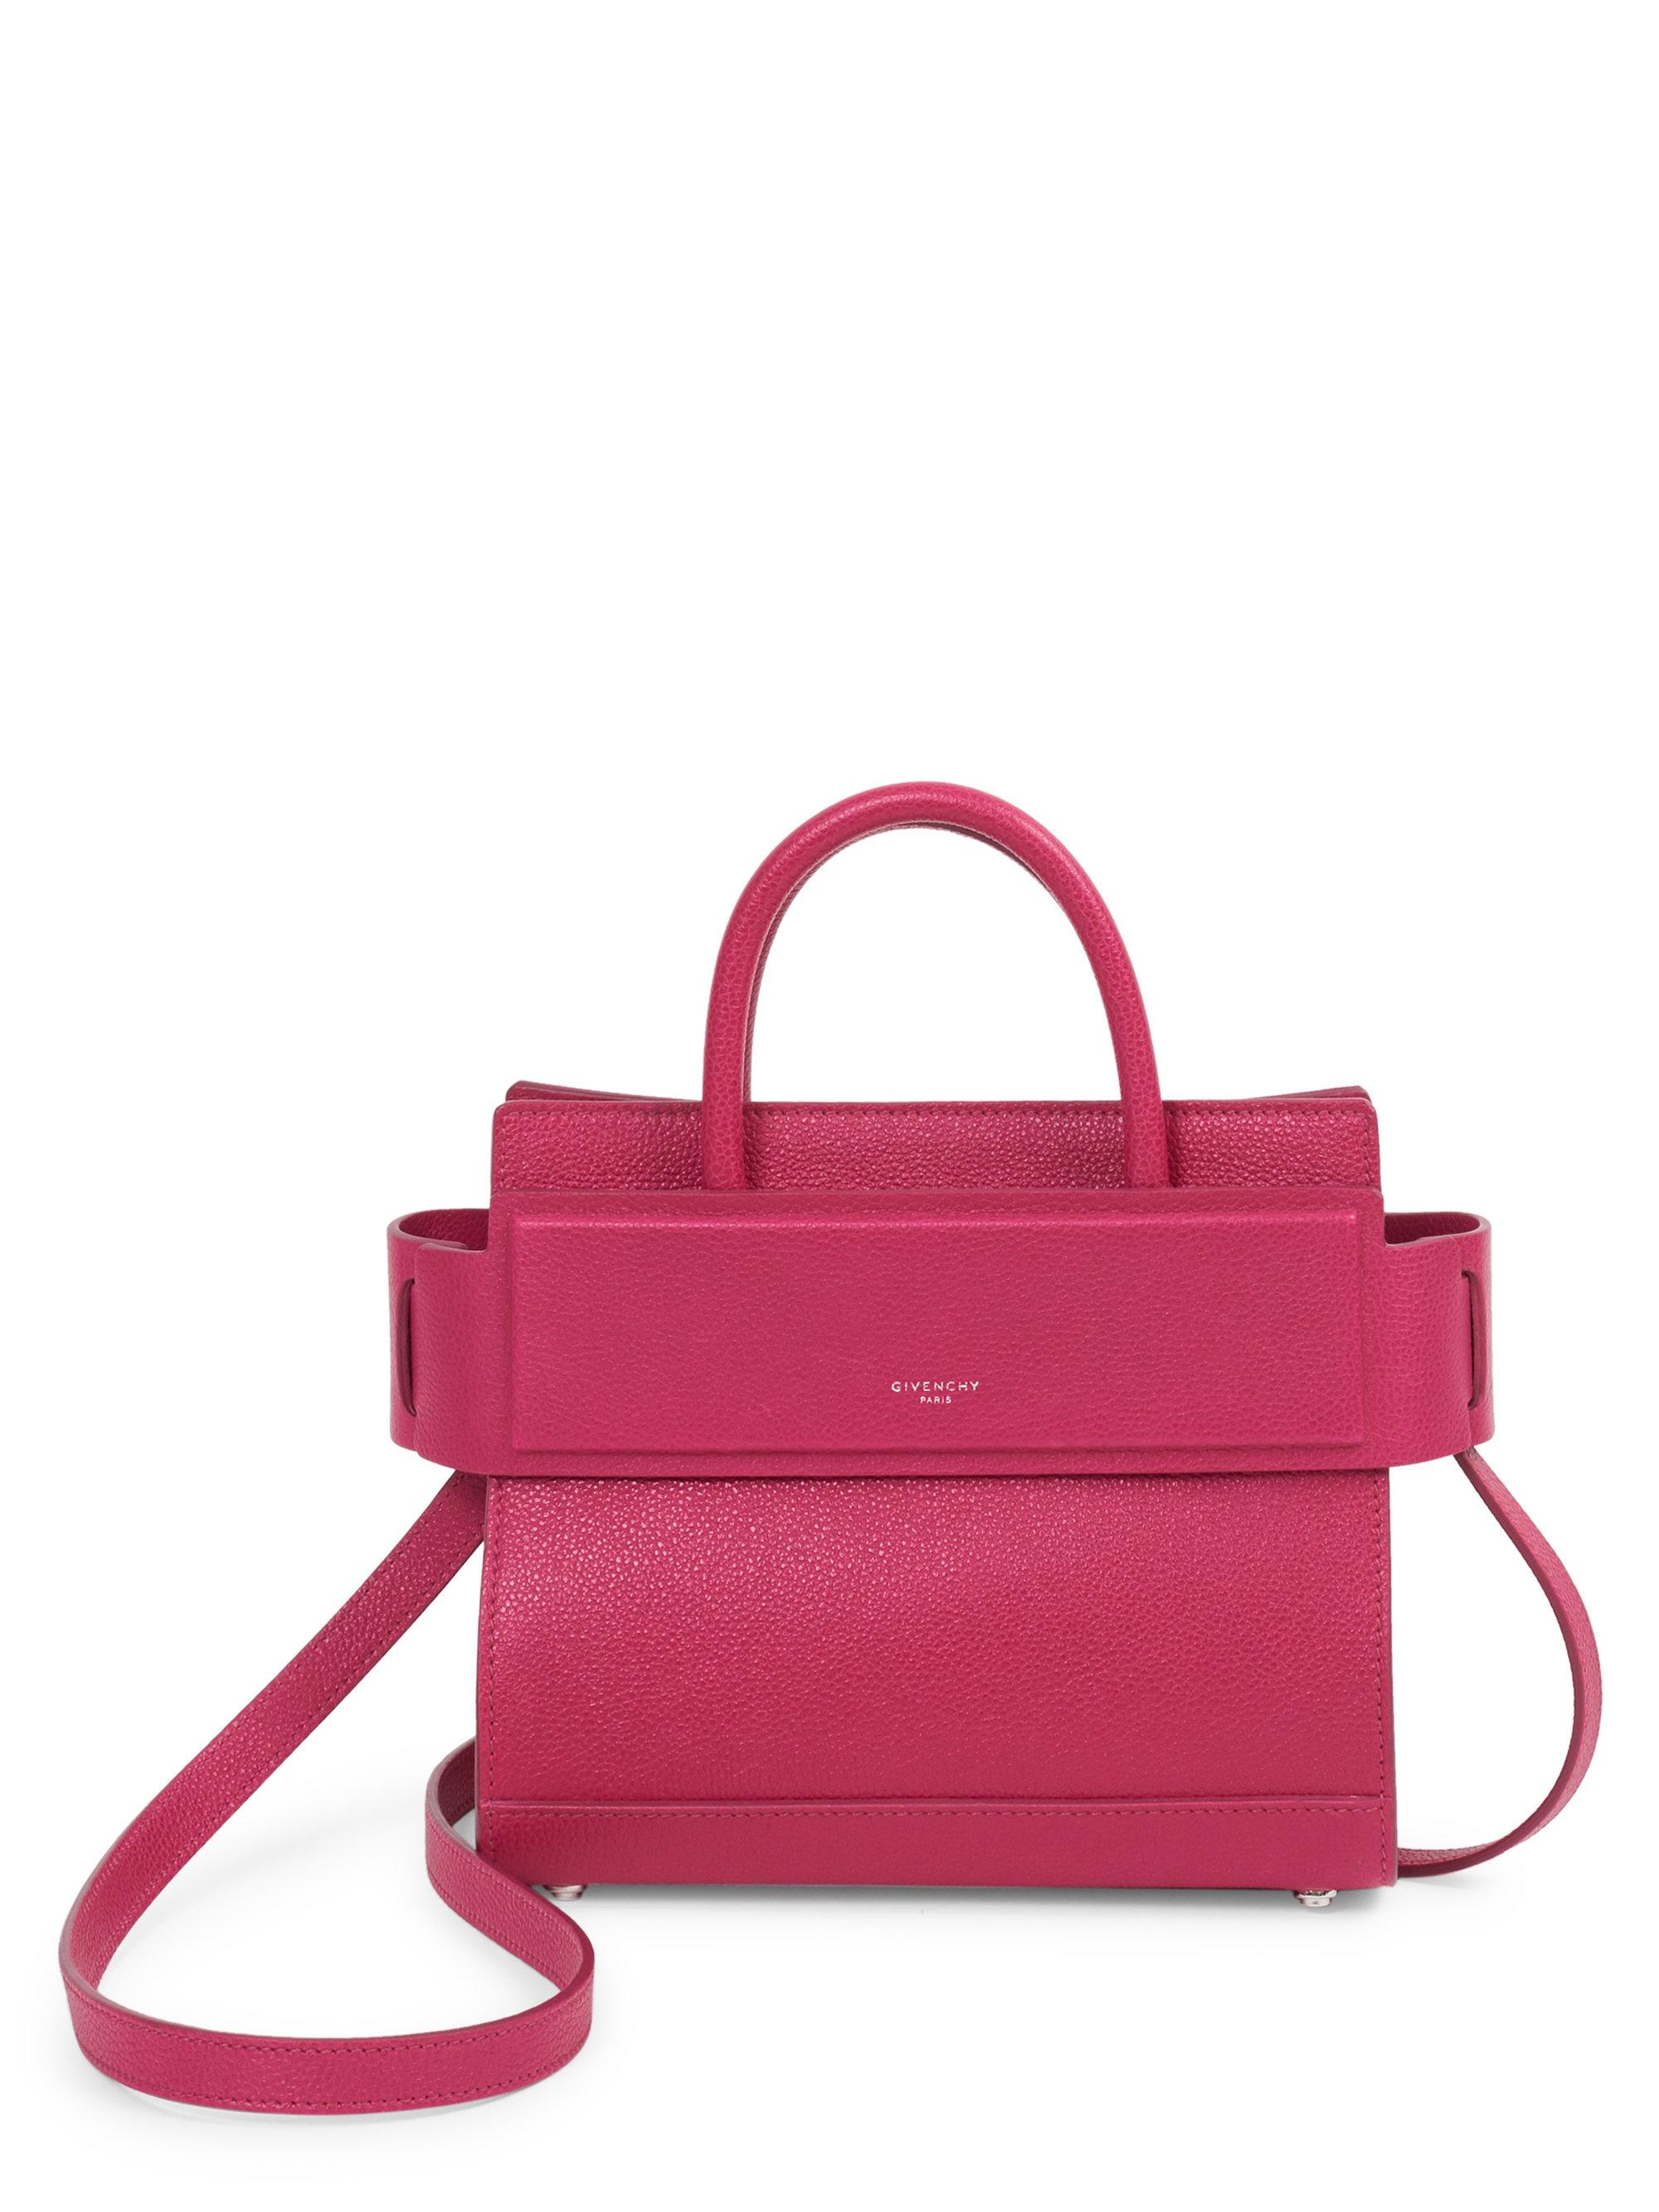 Horizon Color-Block Leather Mini Bag Givenchy O6qcwFb